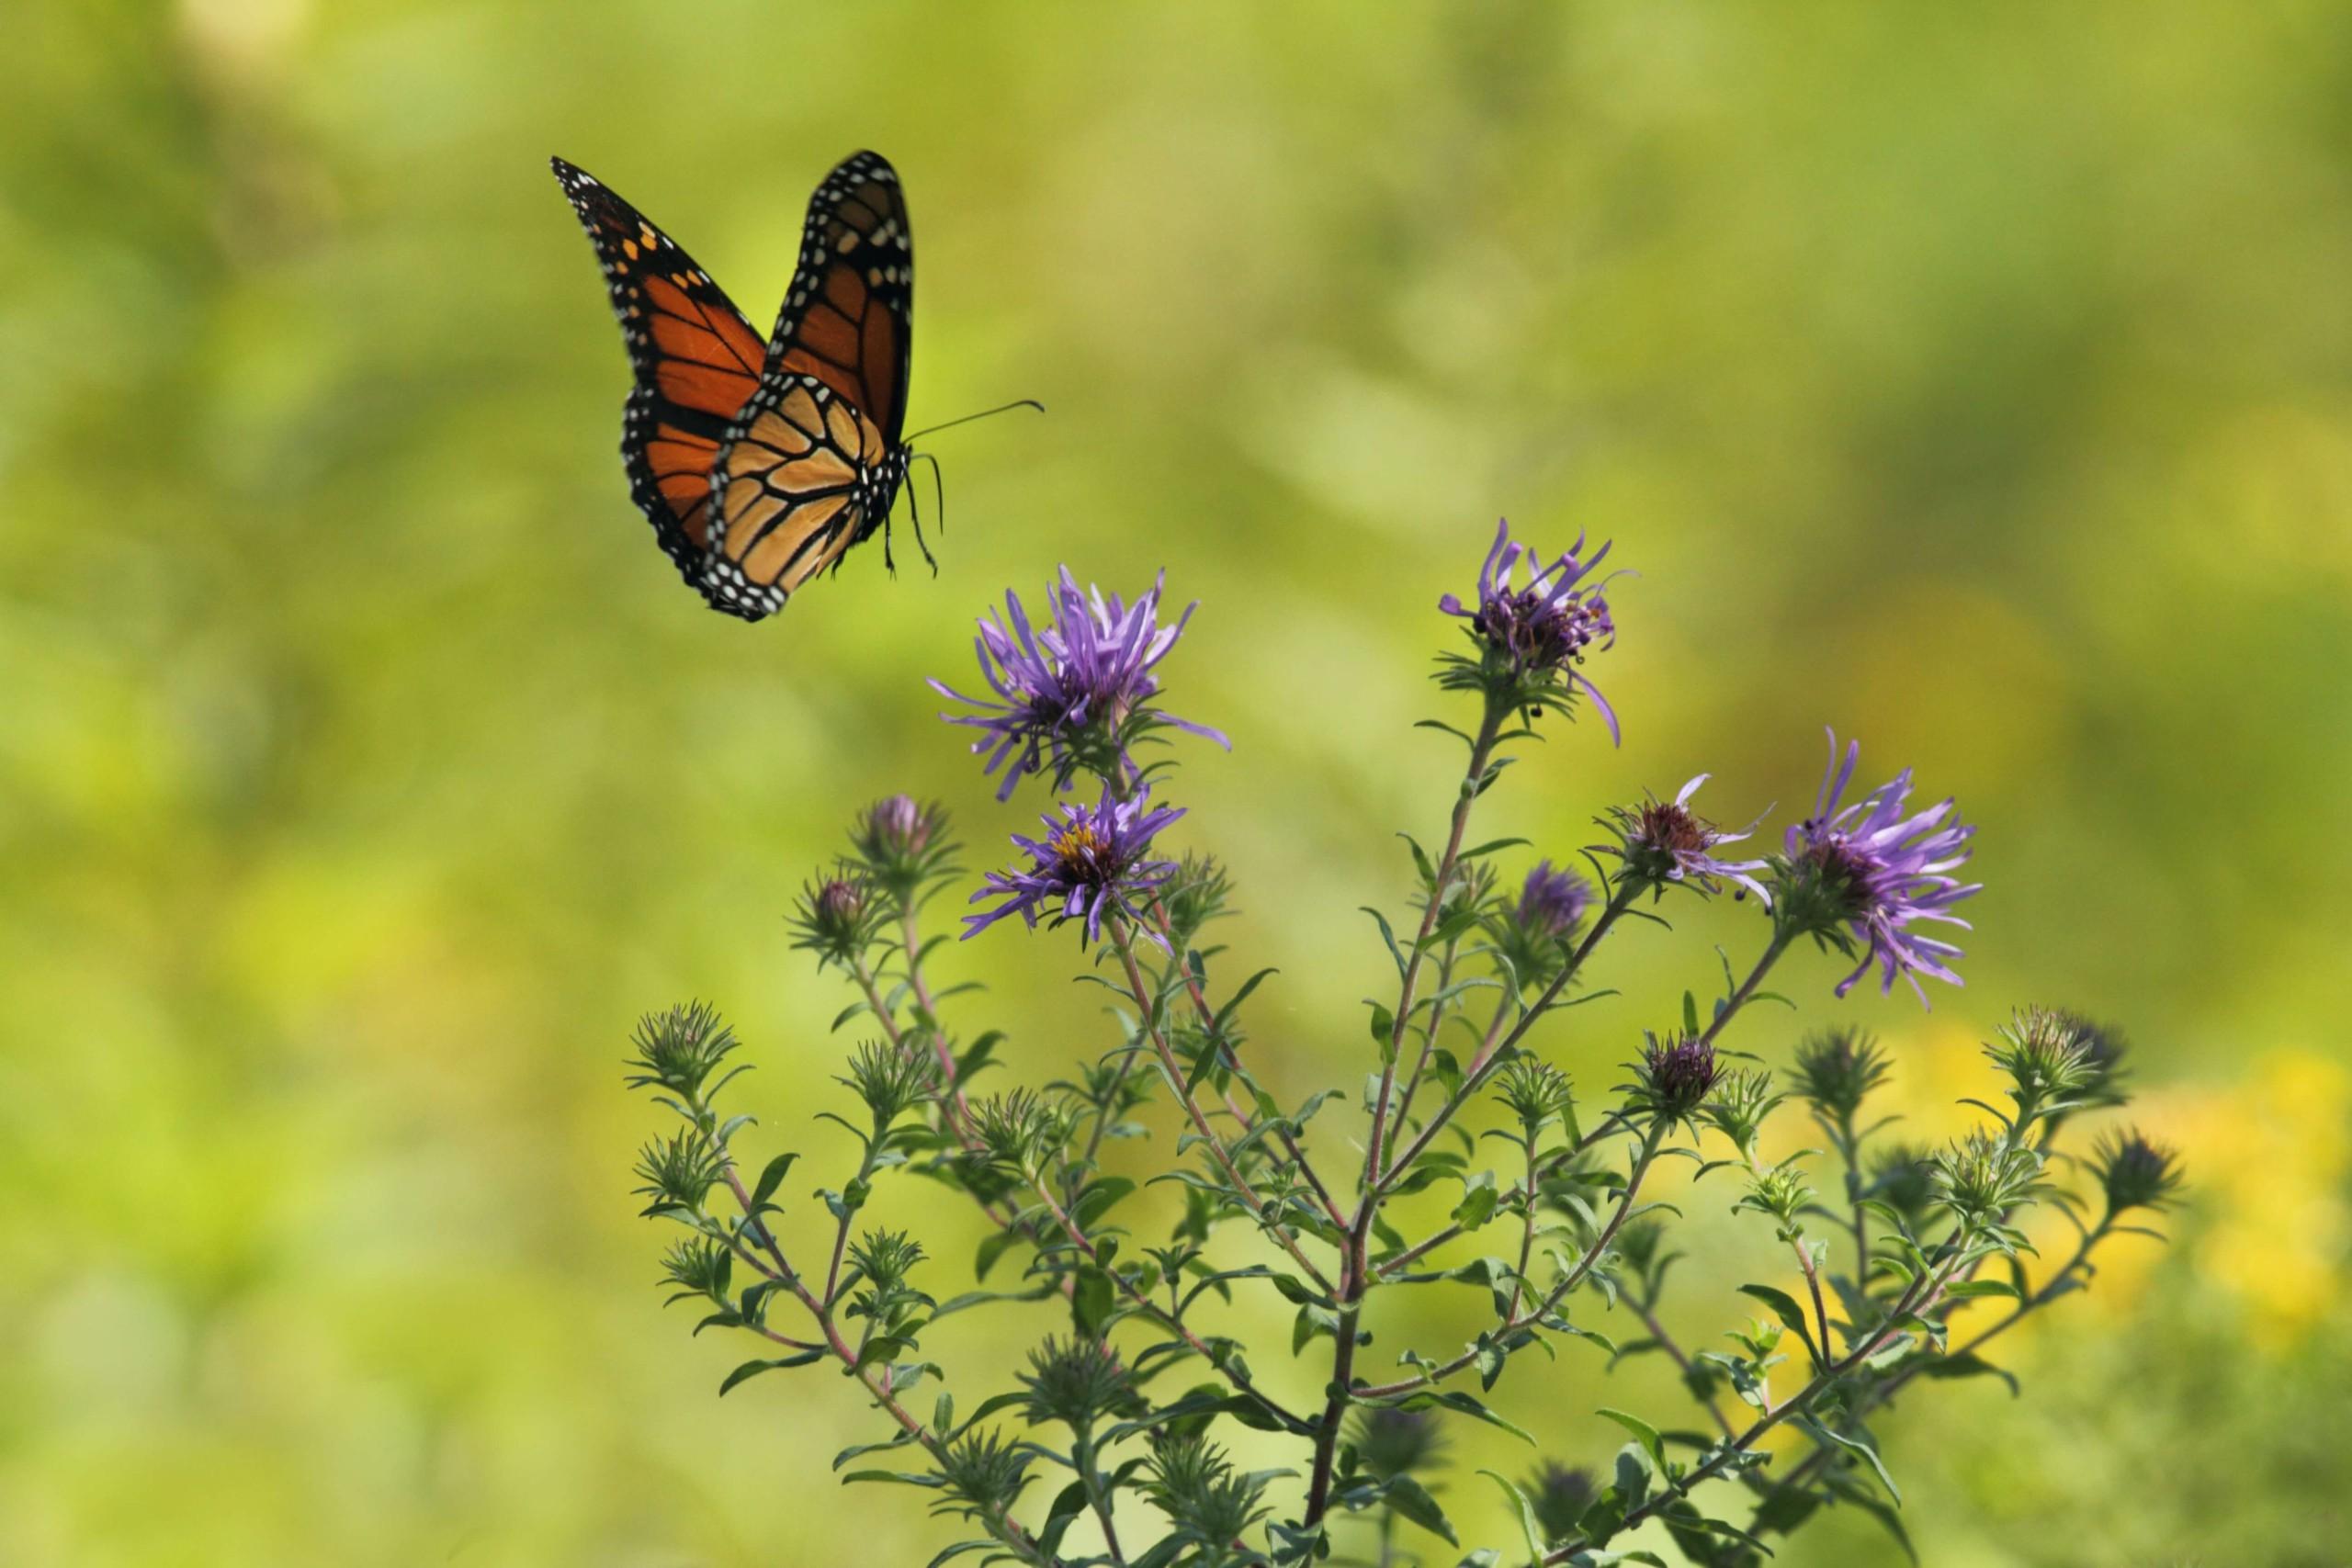 jardin asilvestrado mariposas